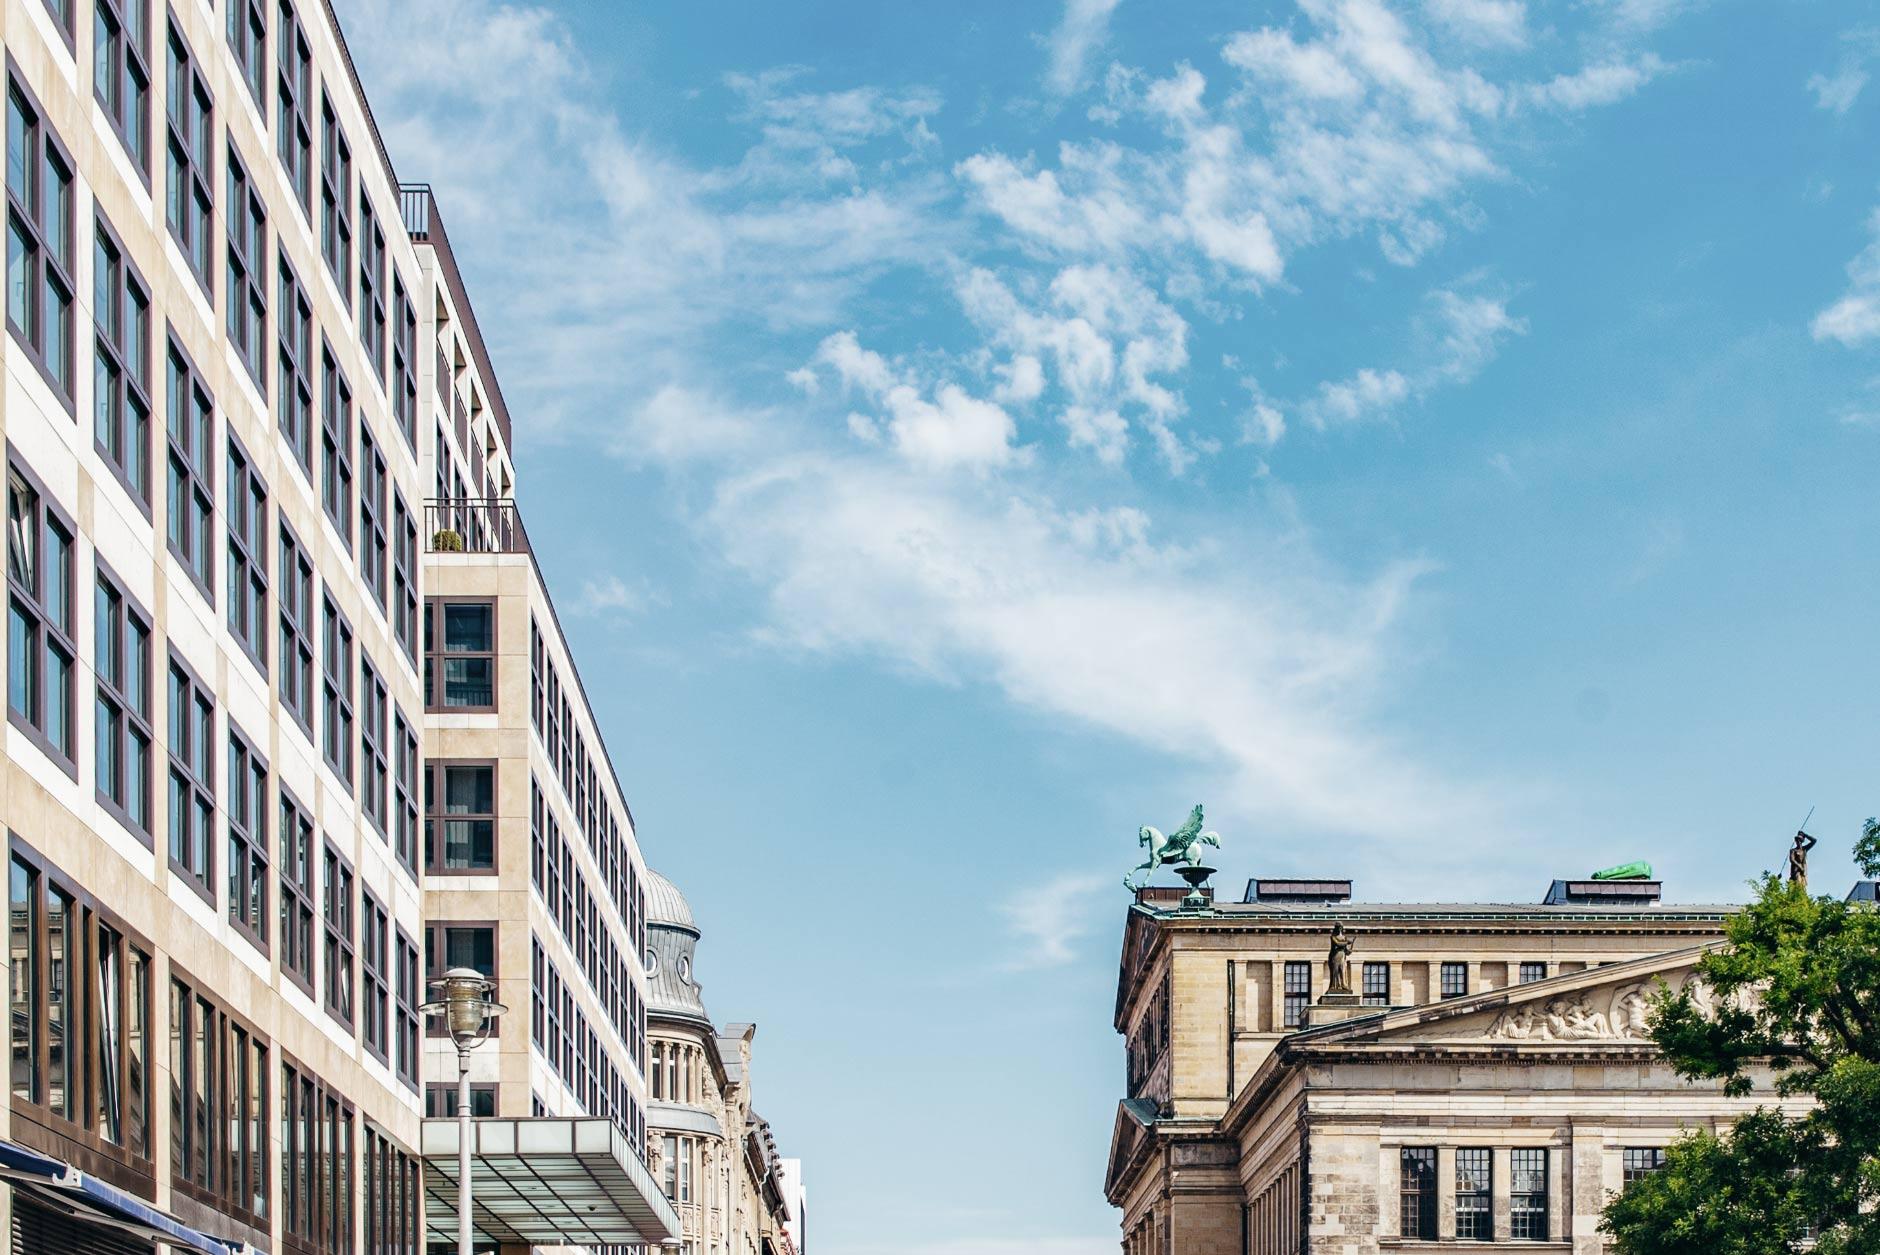 berlin-sightseeing-mitte-03